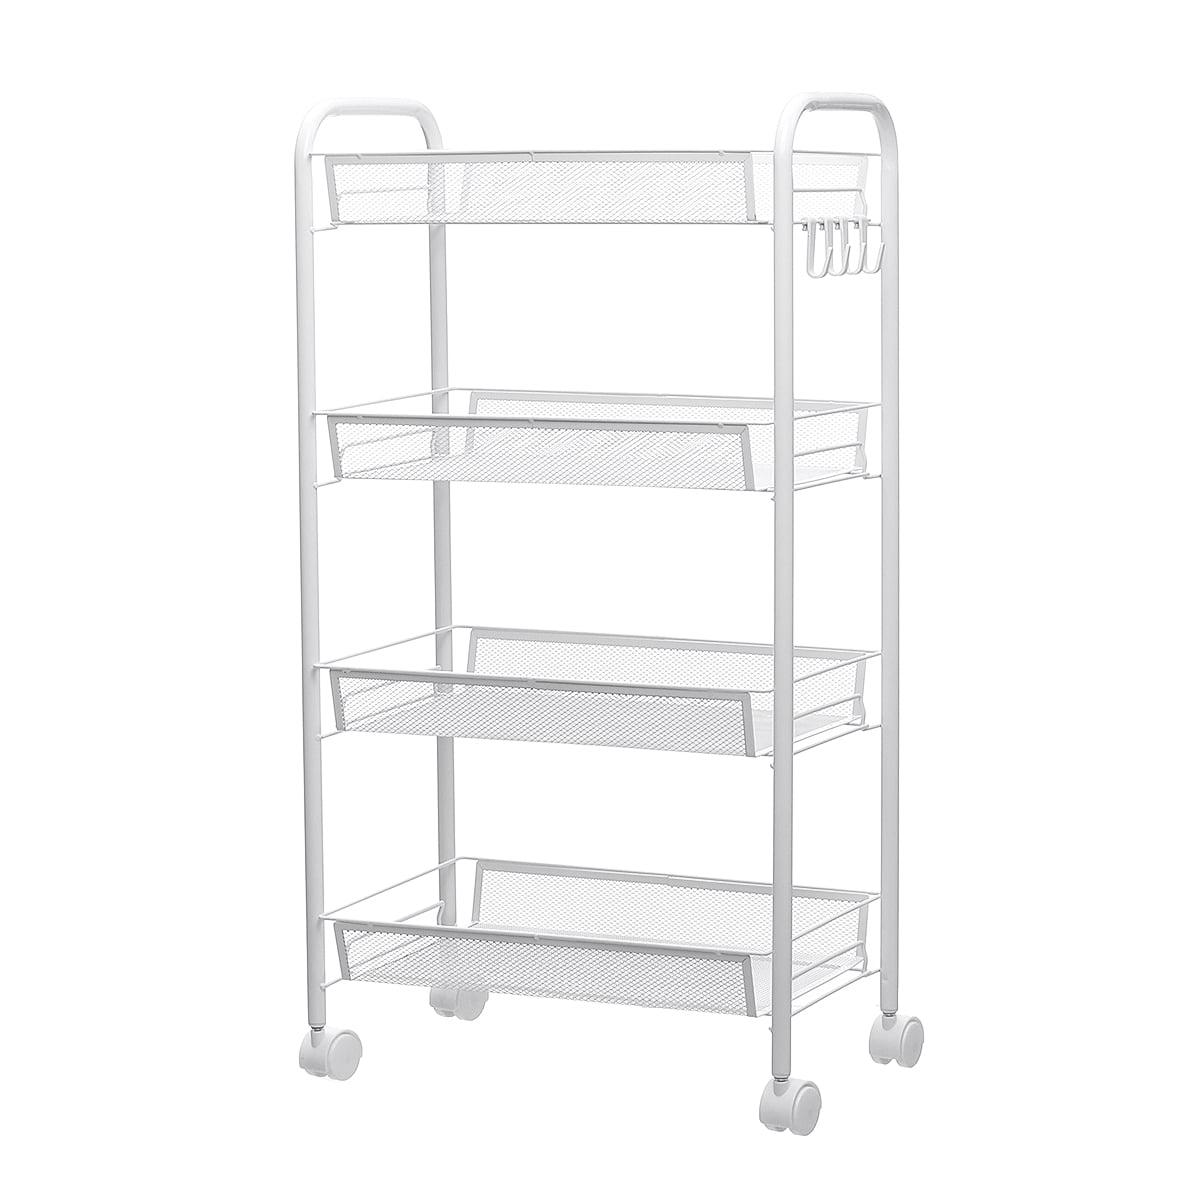 Bestller 5-Shelf Shelving Storage Unit White Stainless ...